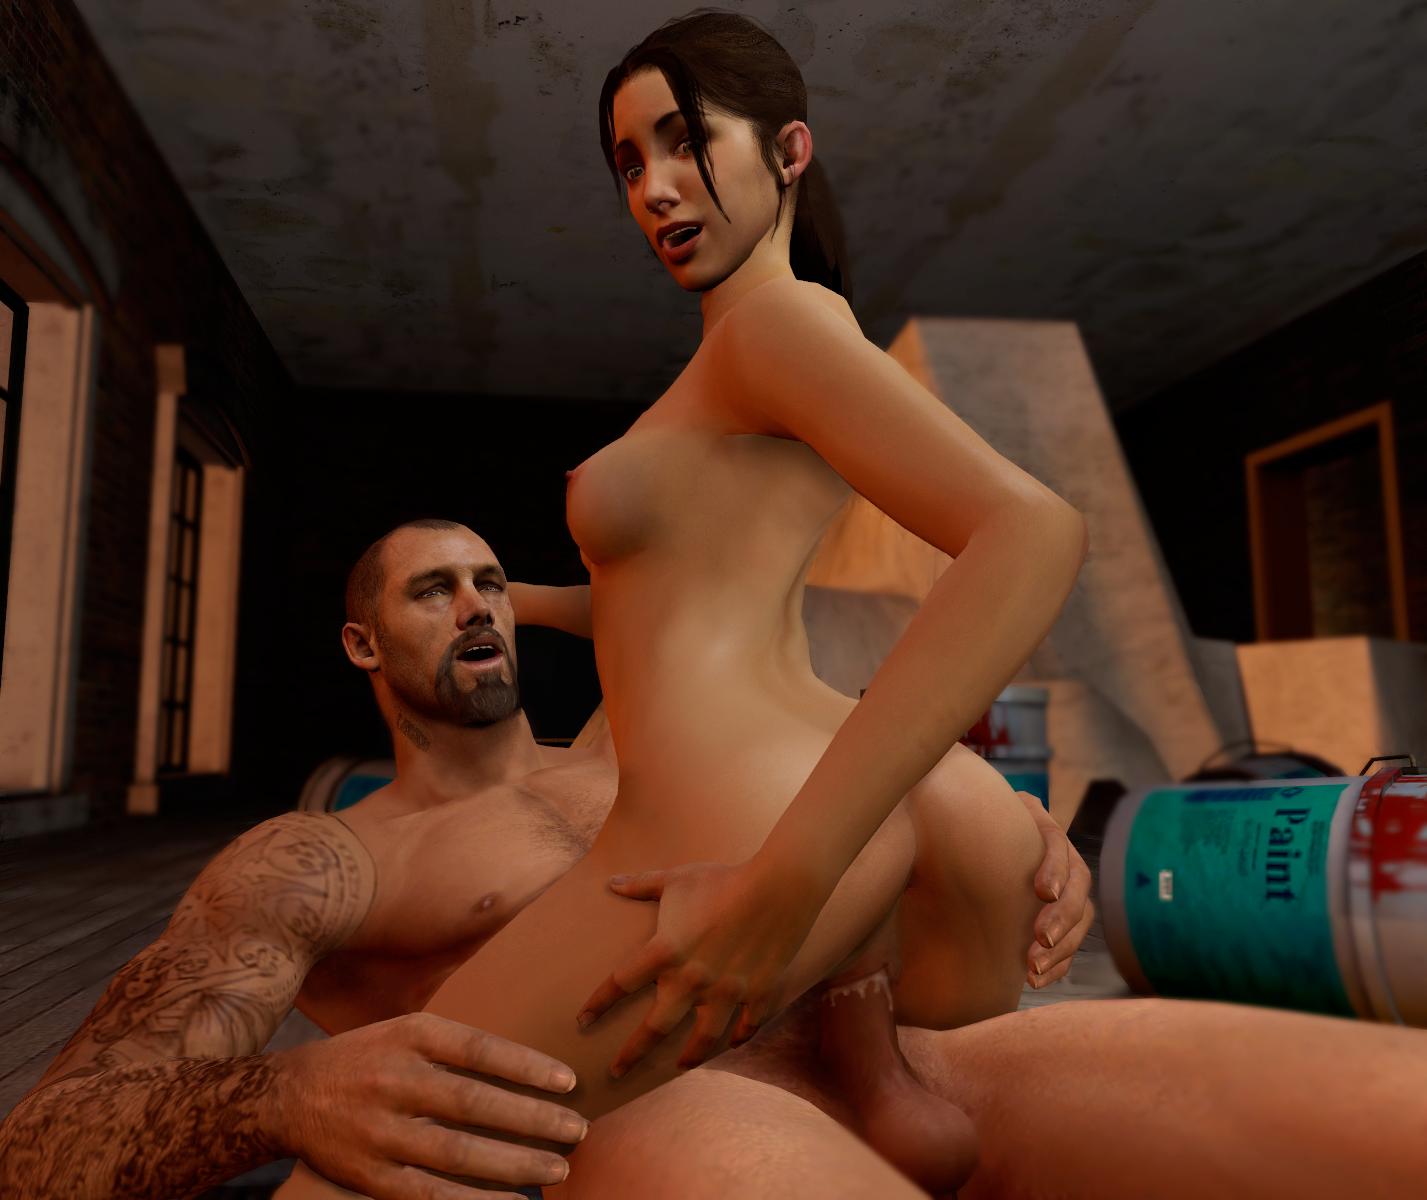 Shops Sex